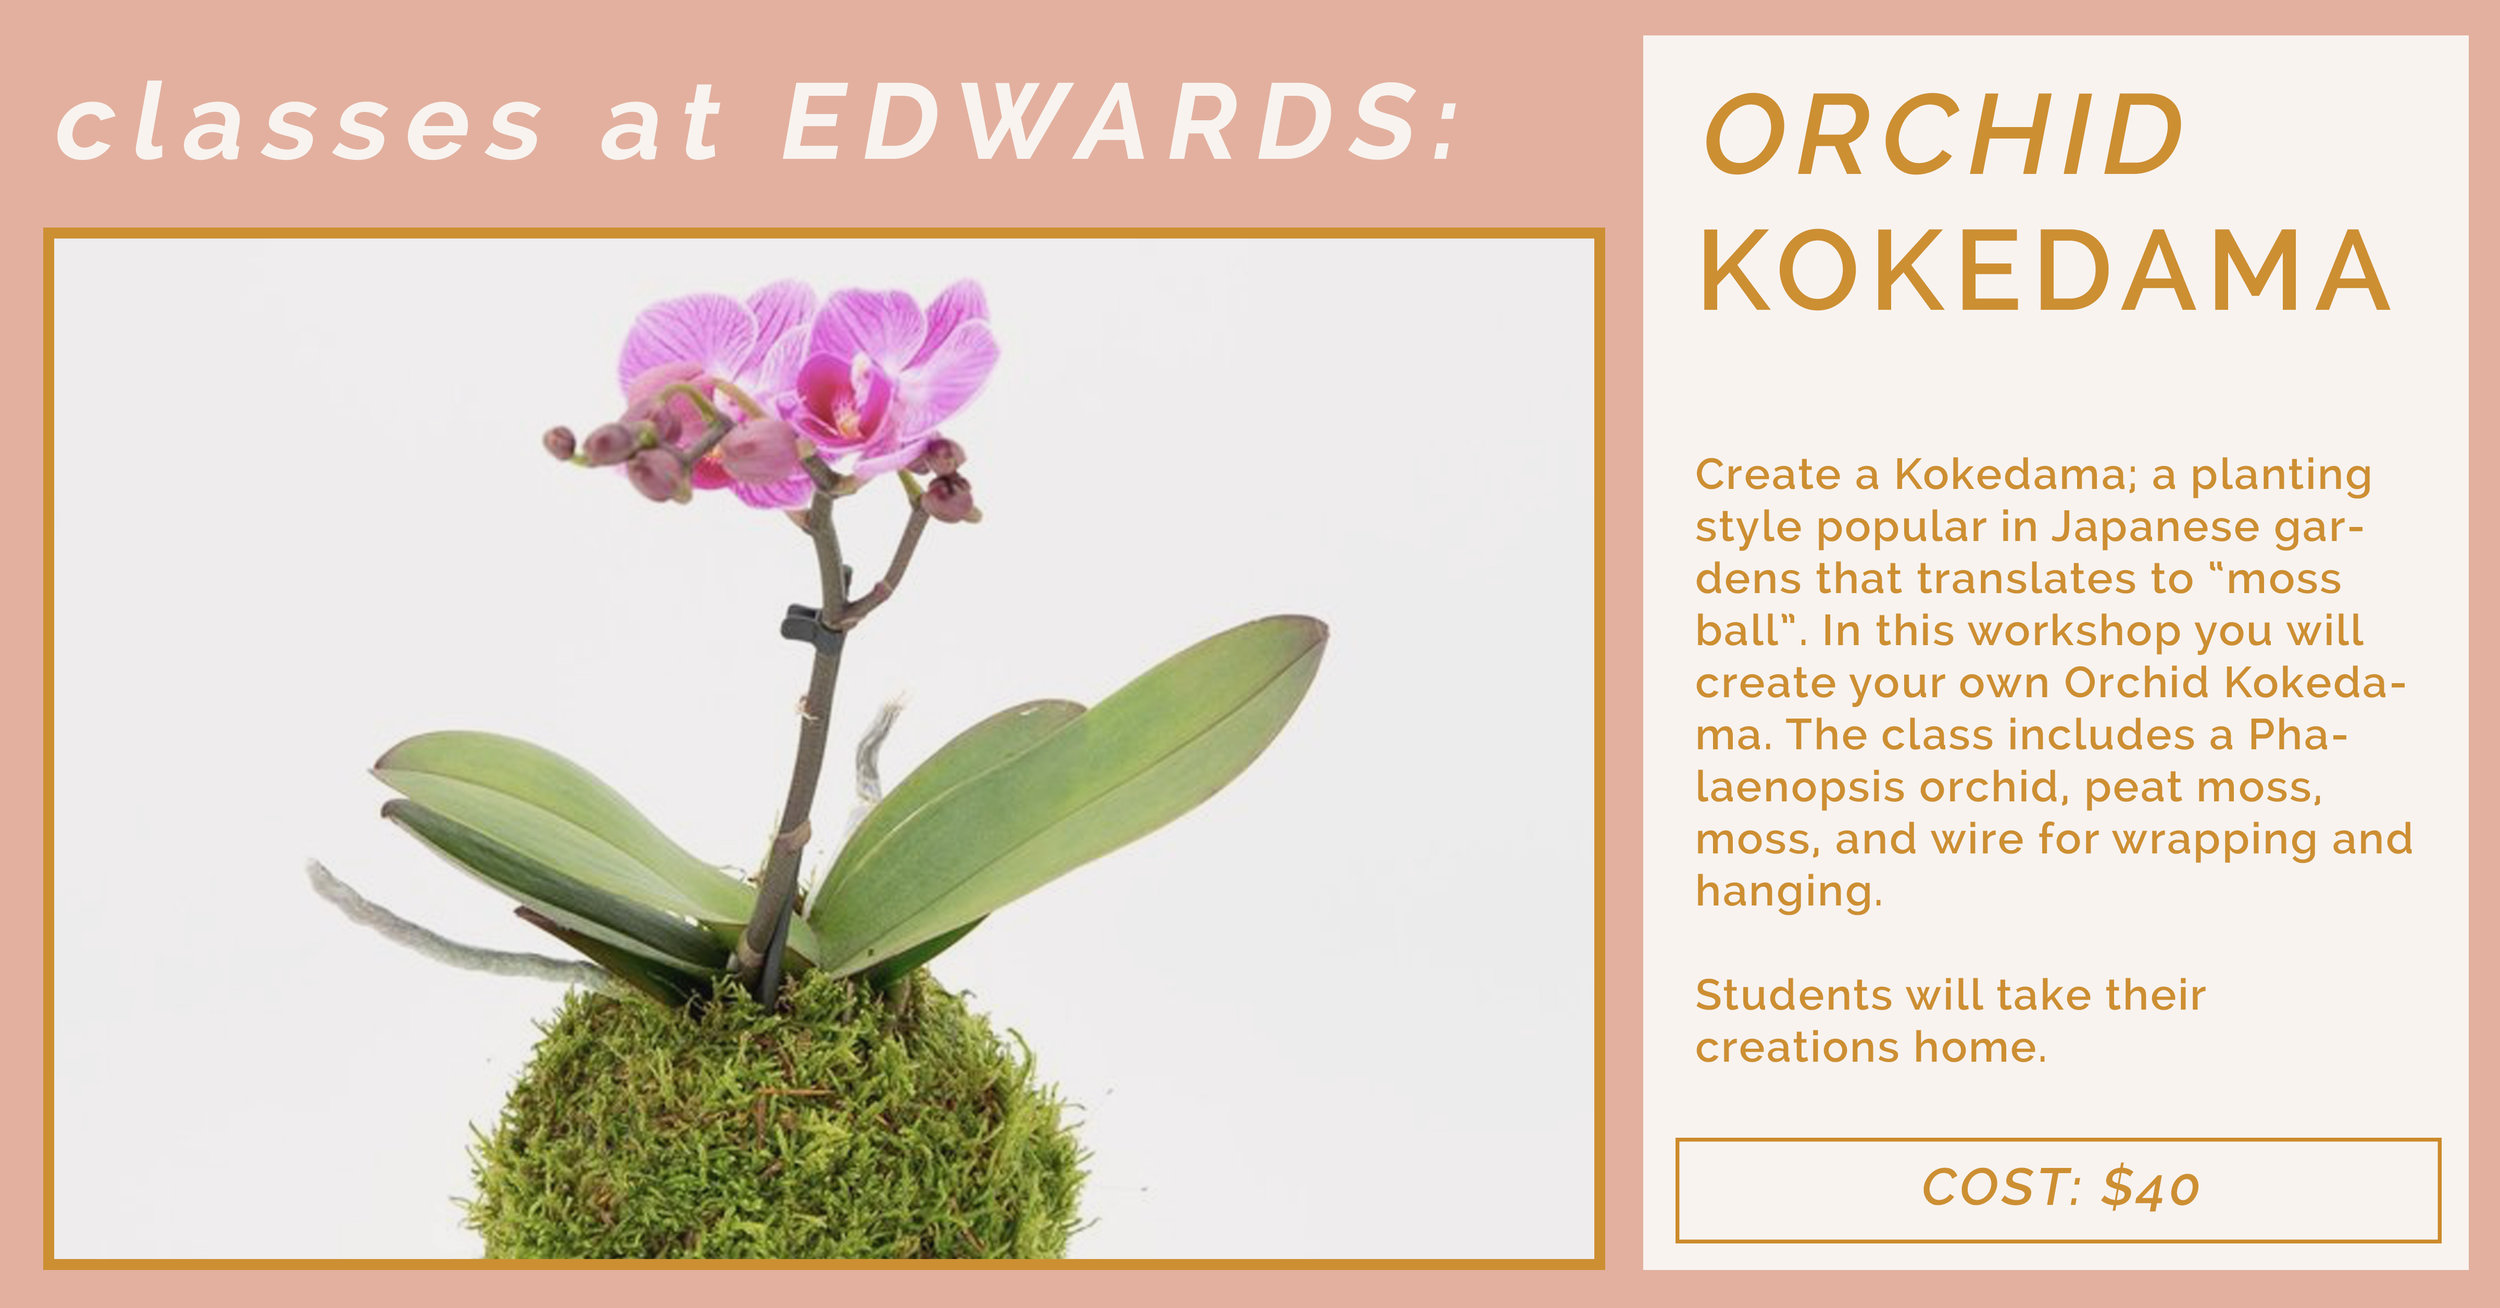 orchid kokedama.jpg